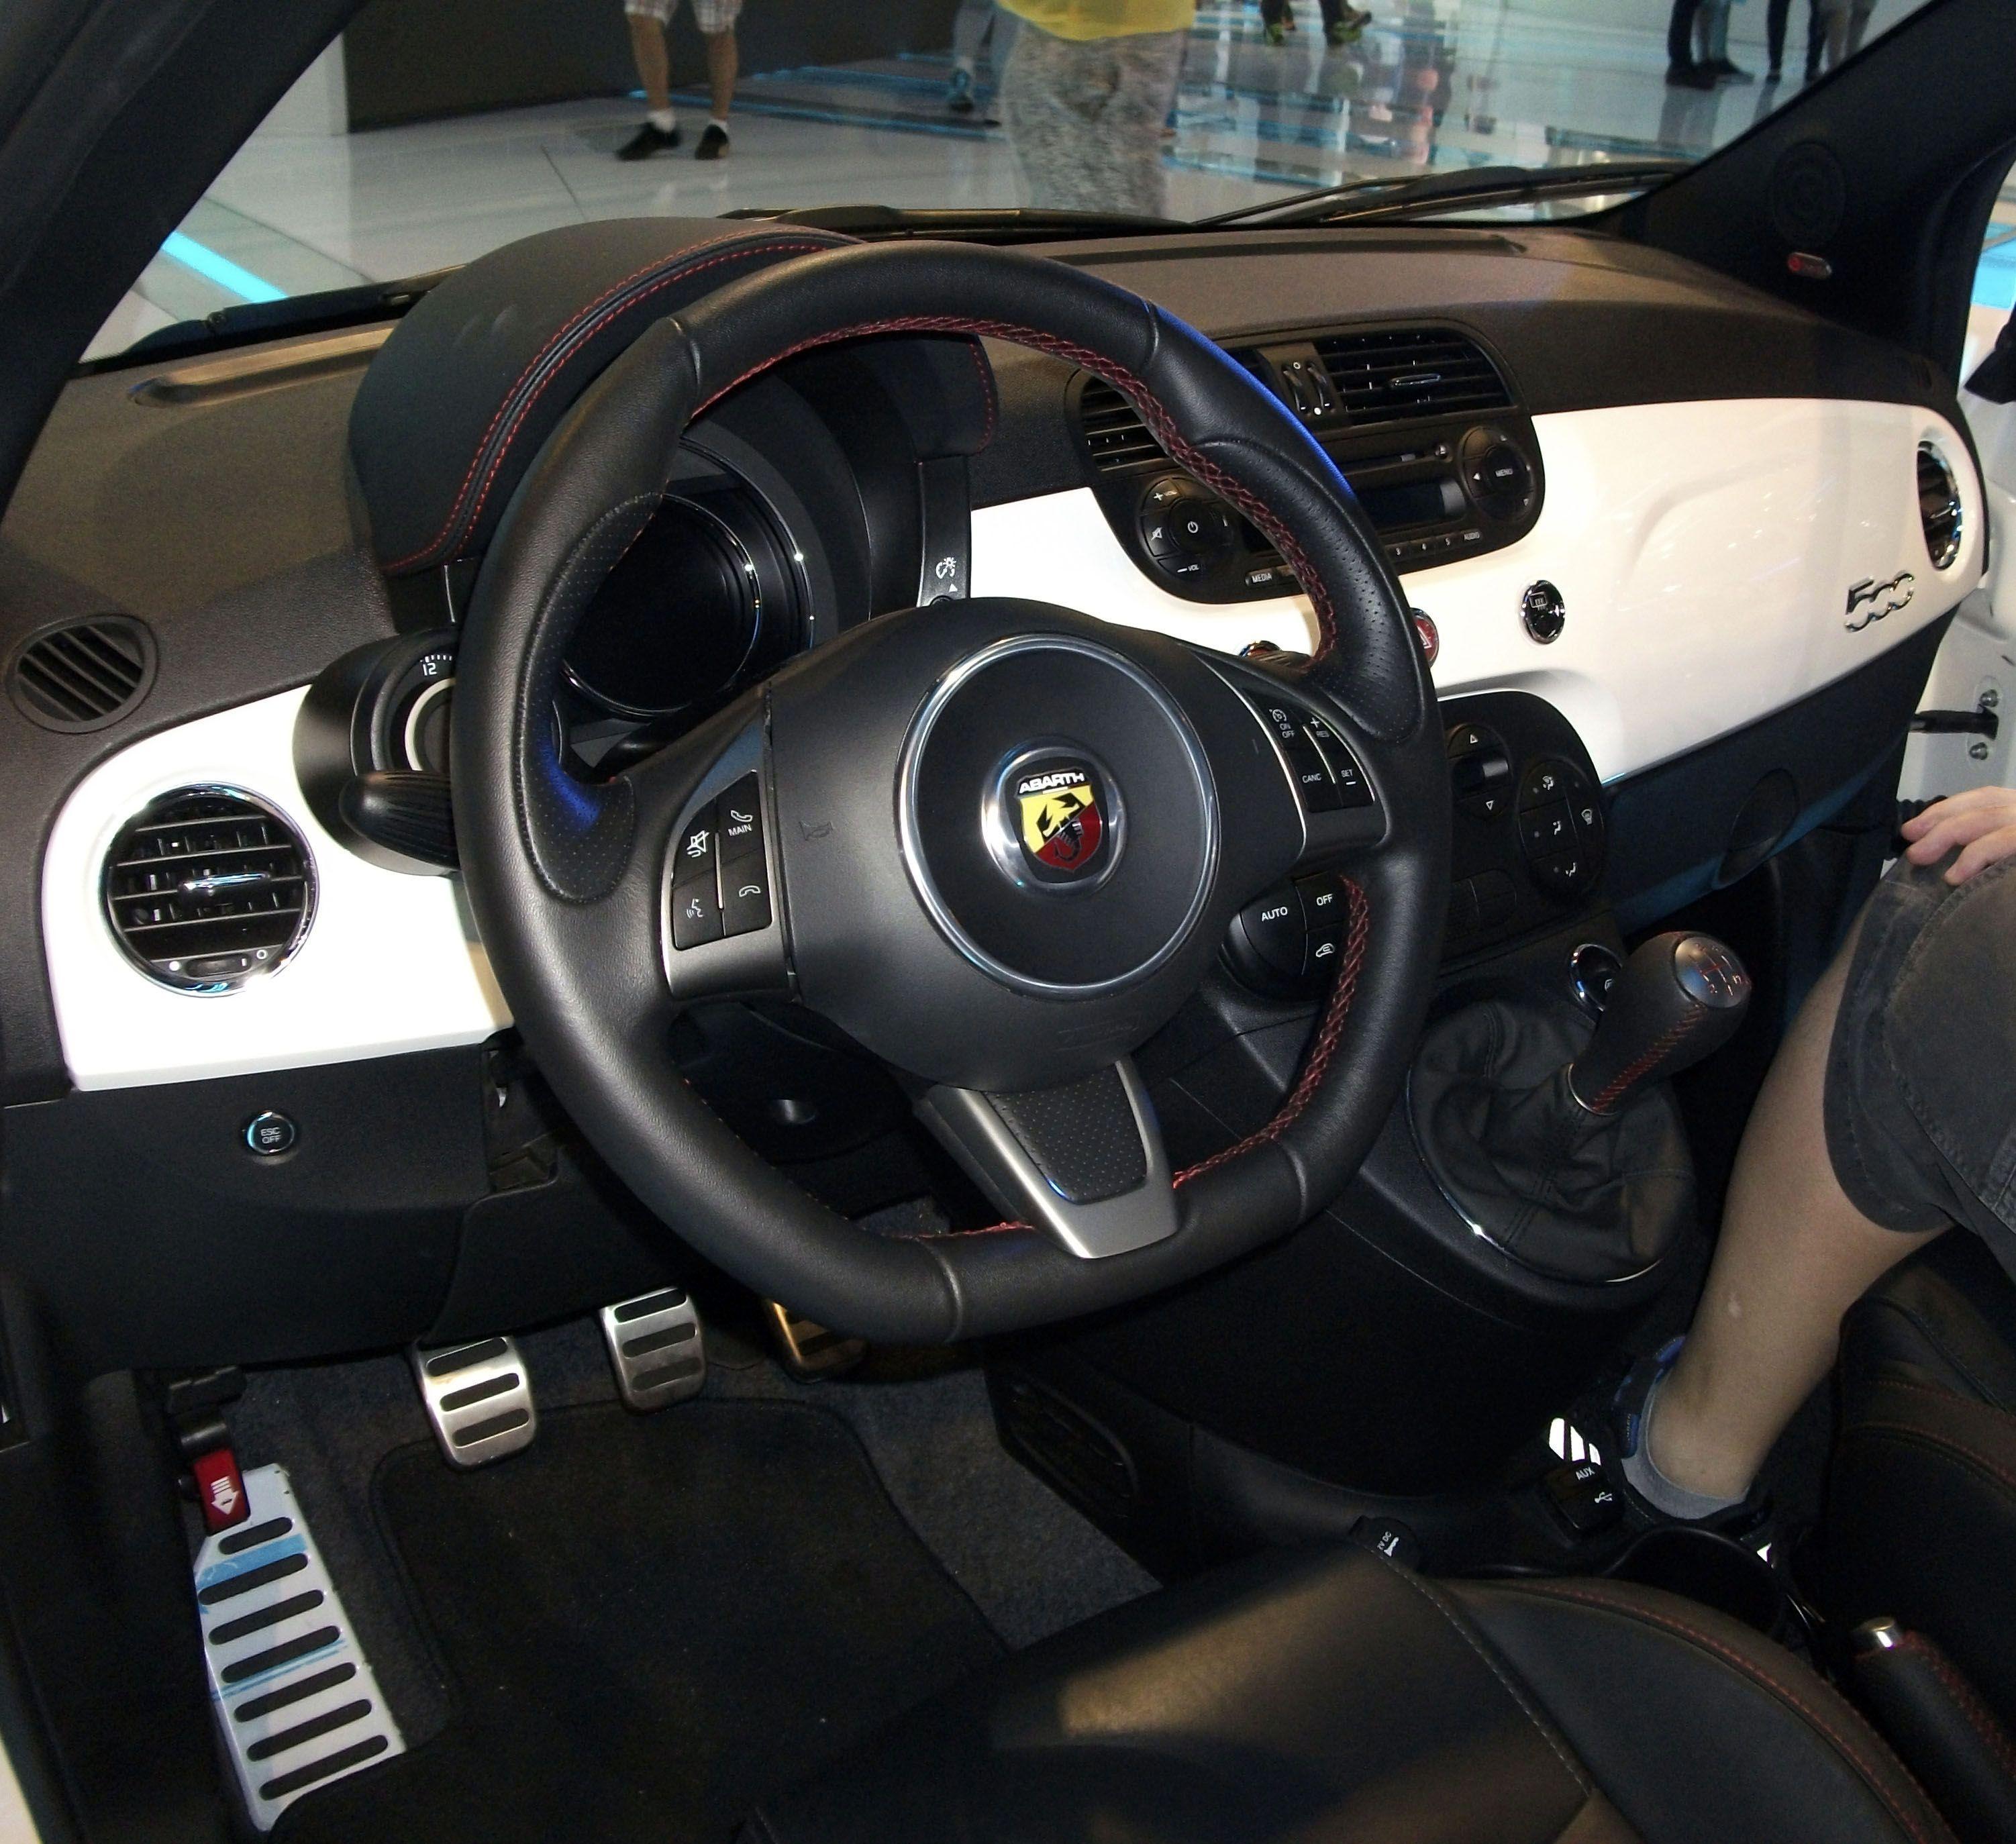 Fiat 500 Abarth interior | Fiat | Pinterest | Fiat and Cars